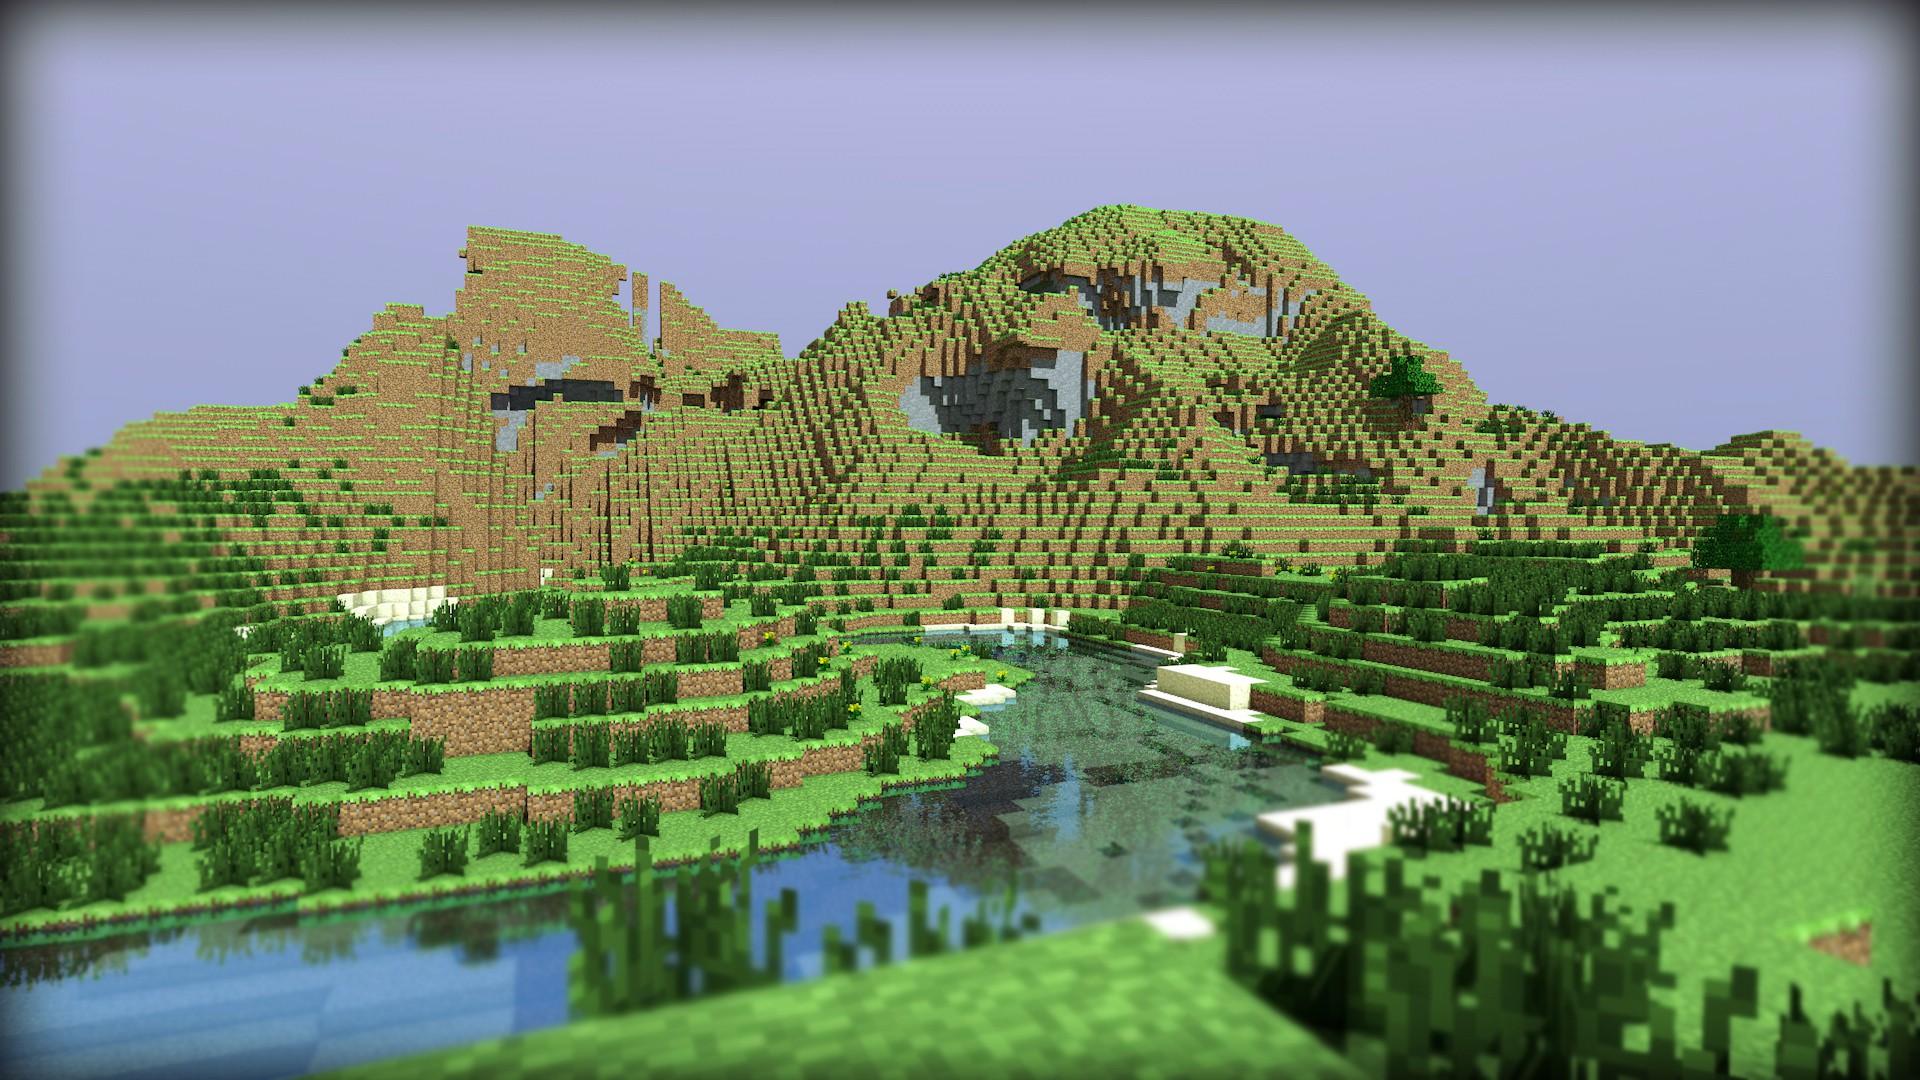 Wonderful Wallpaper Minecraft Landscape - f9fb062388b530acd780e5075b844c94  Graphic_206699.jpg